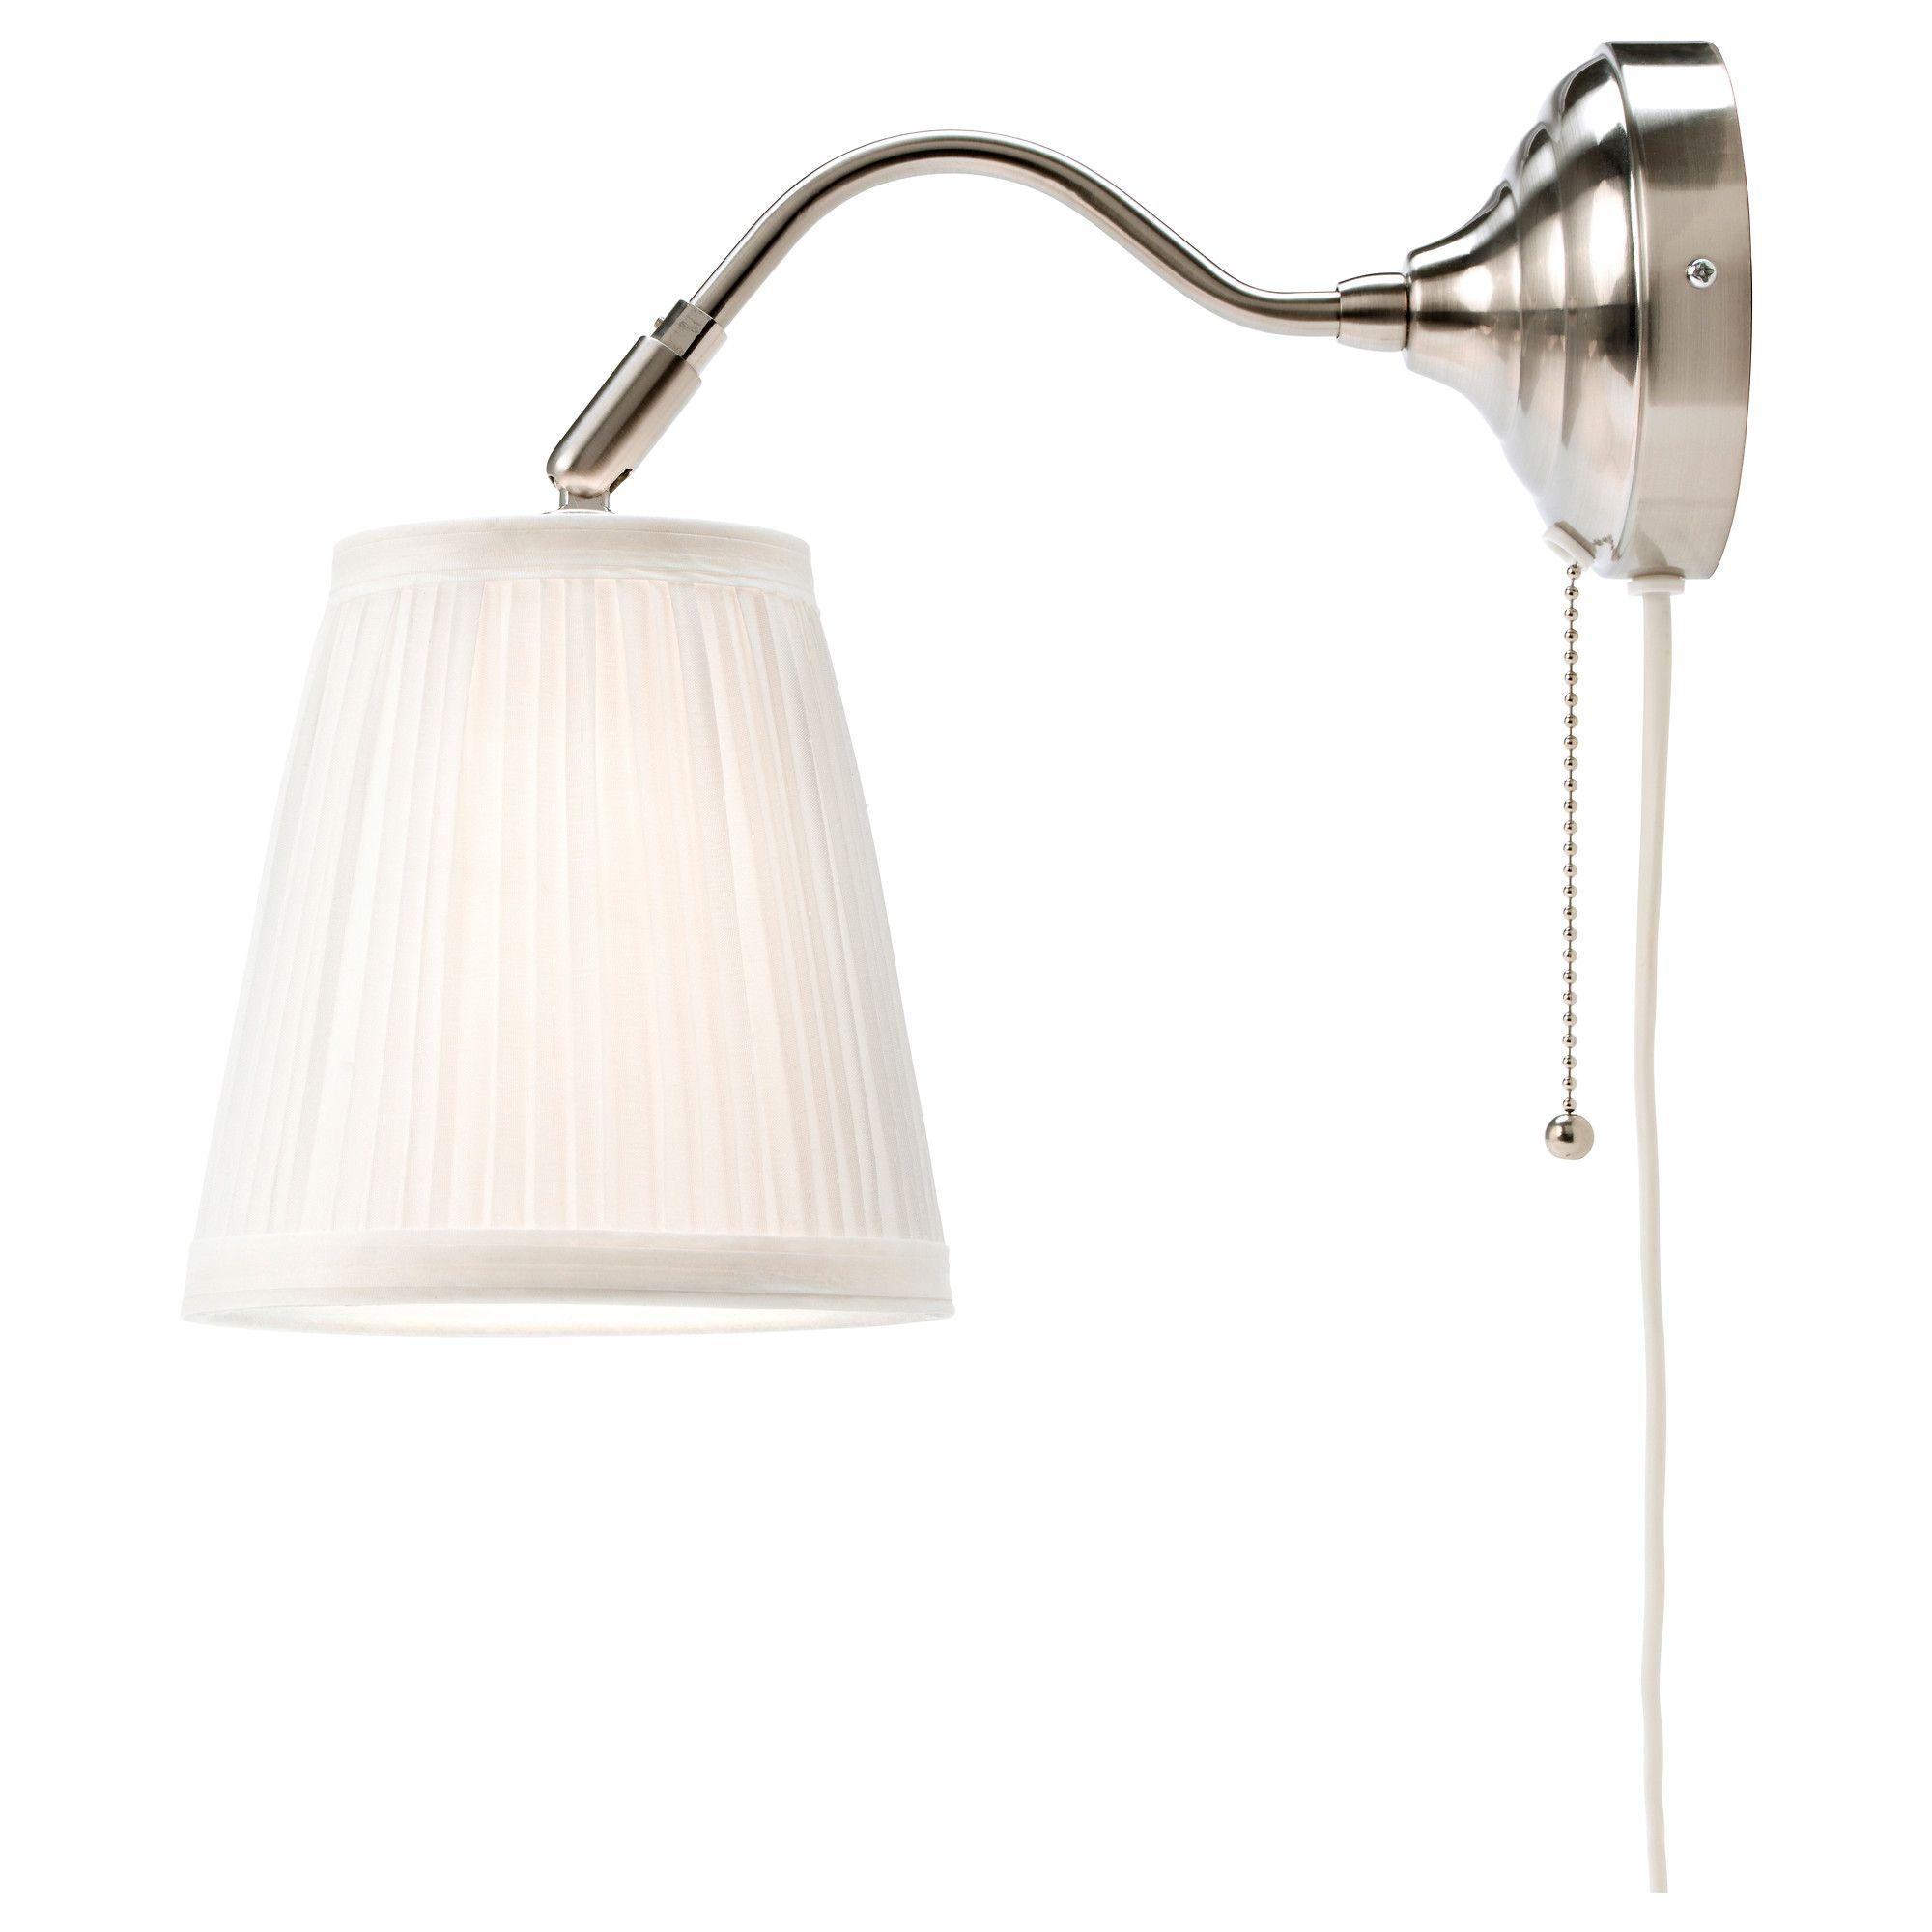 Us Furniture And Home Furnishings Ikea Wall Lamp Ikea Wall